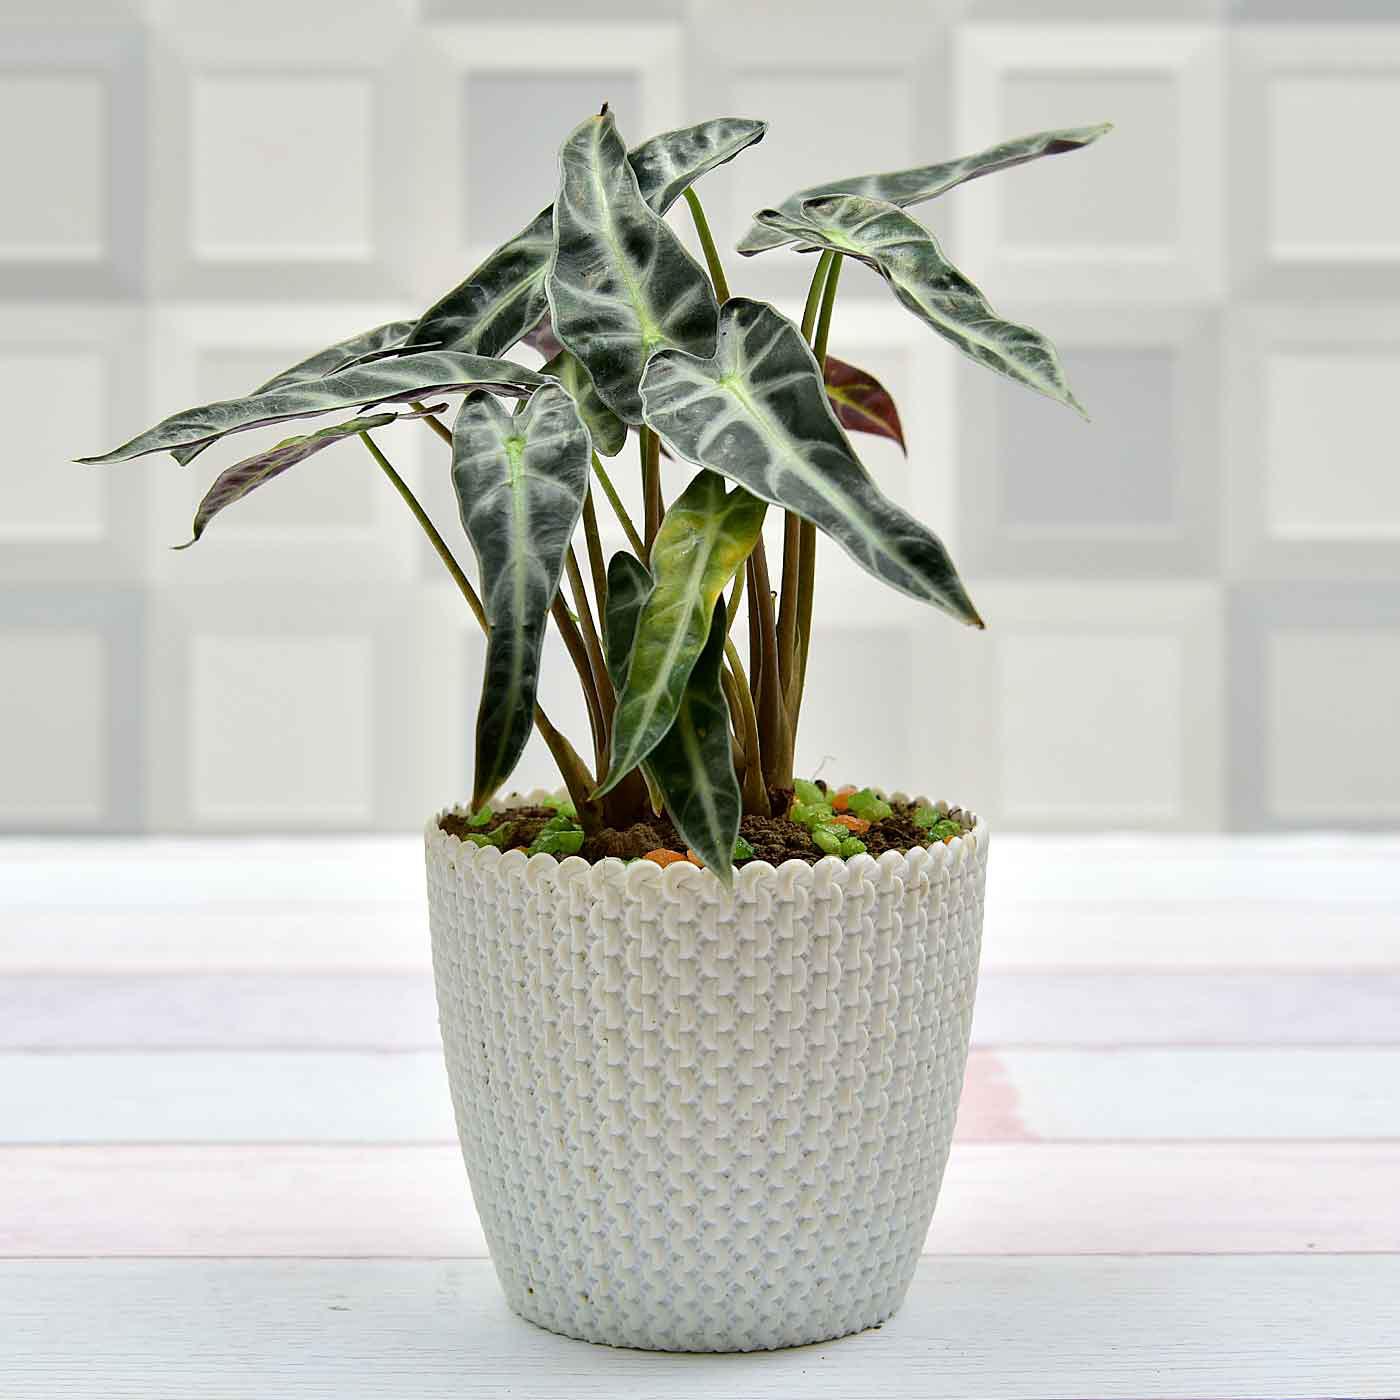 Exotic-Alocasia-Plant-In-White-Textured-Pot